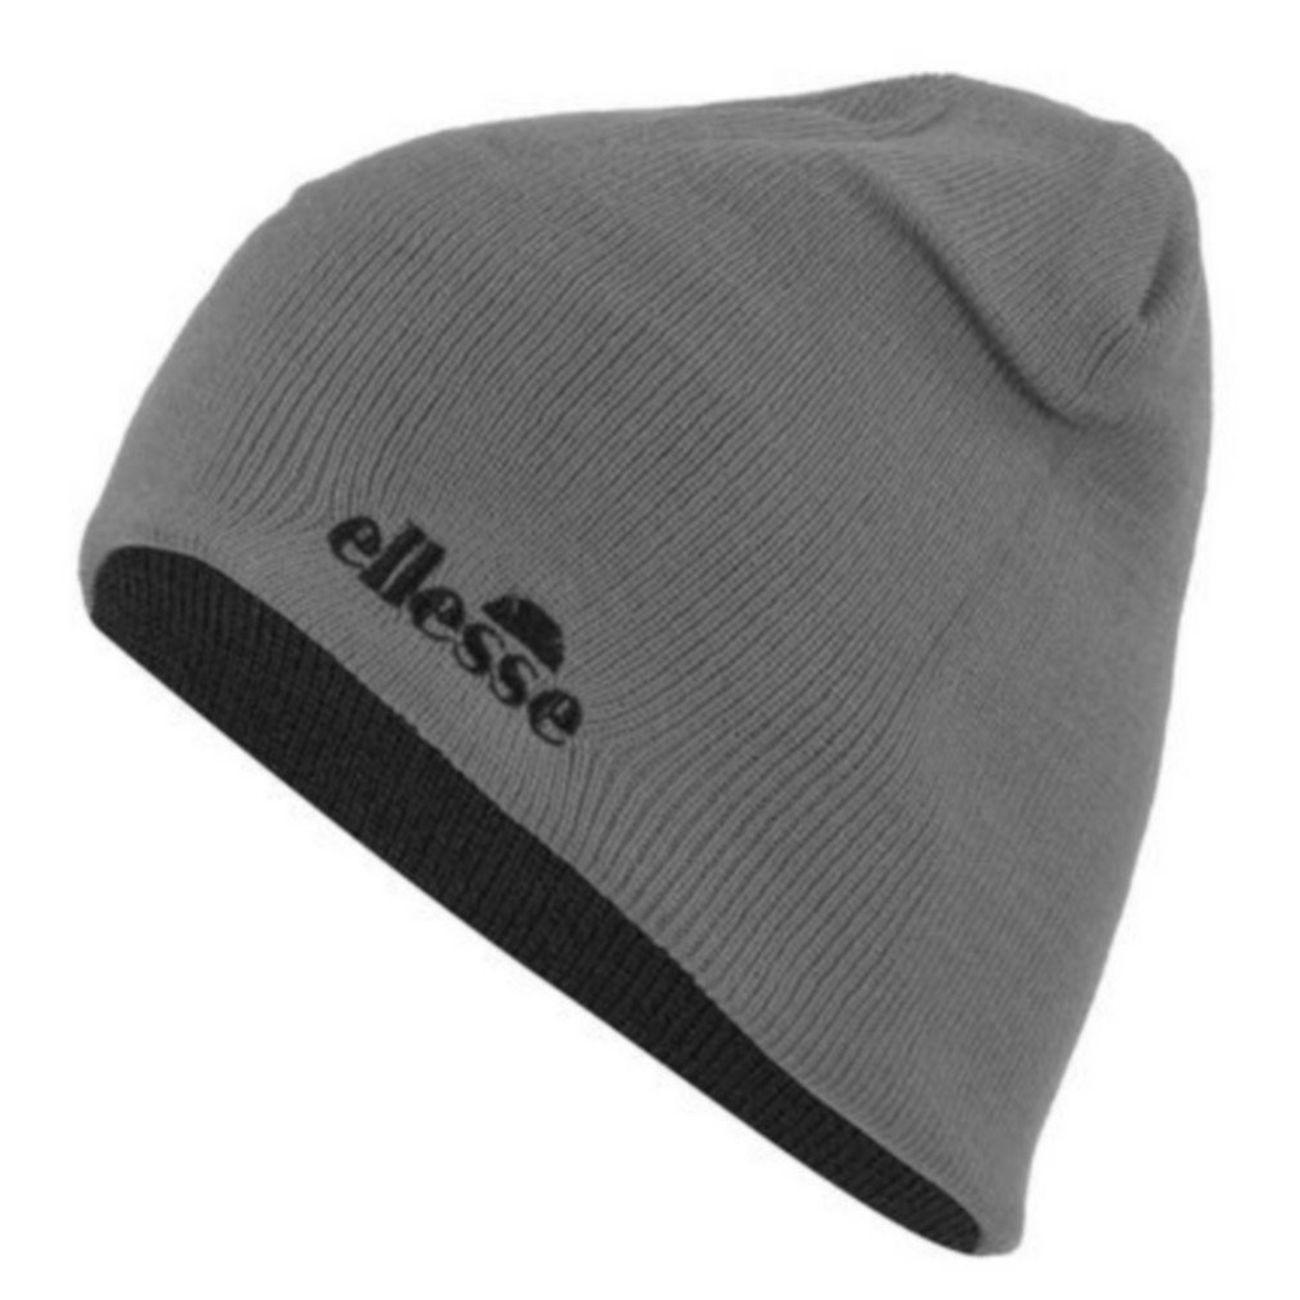 Textile Adulte gt;bonnet Mode Ellesse gt;accessoires fIYbmyg76v